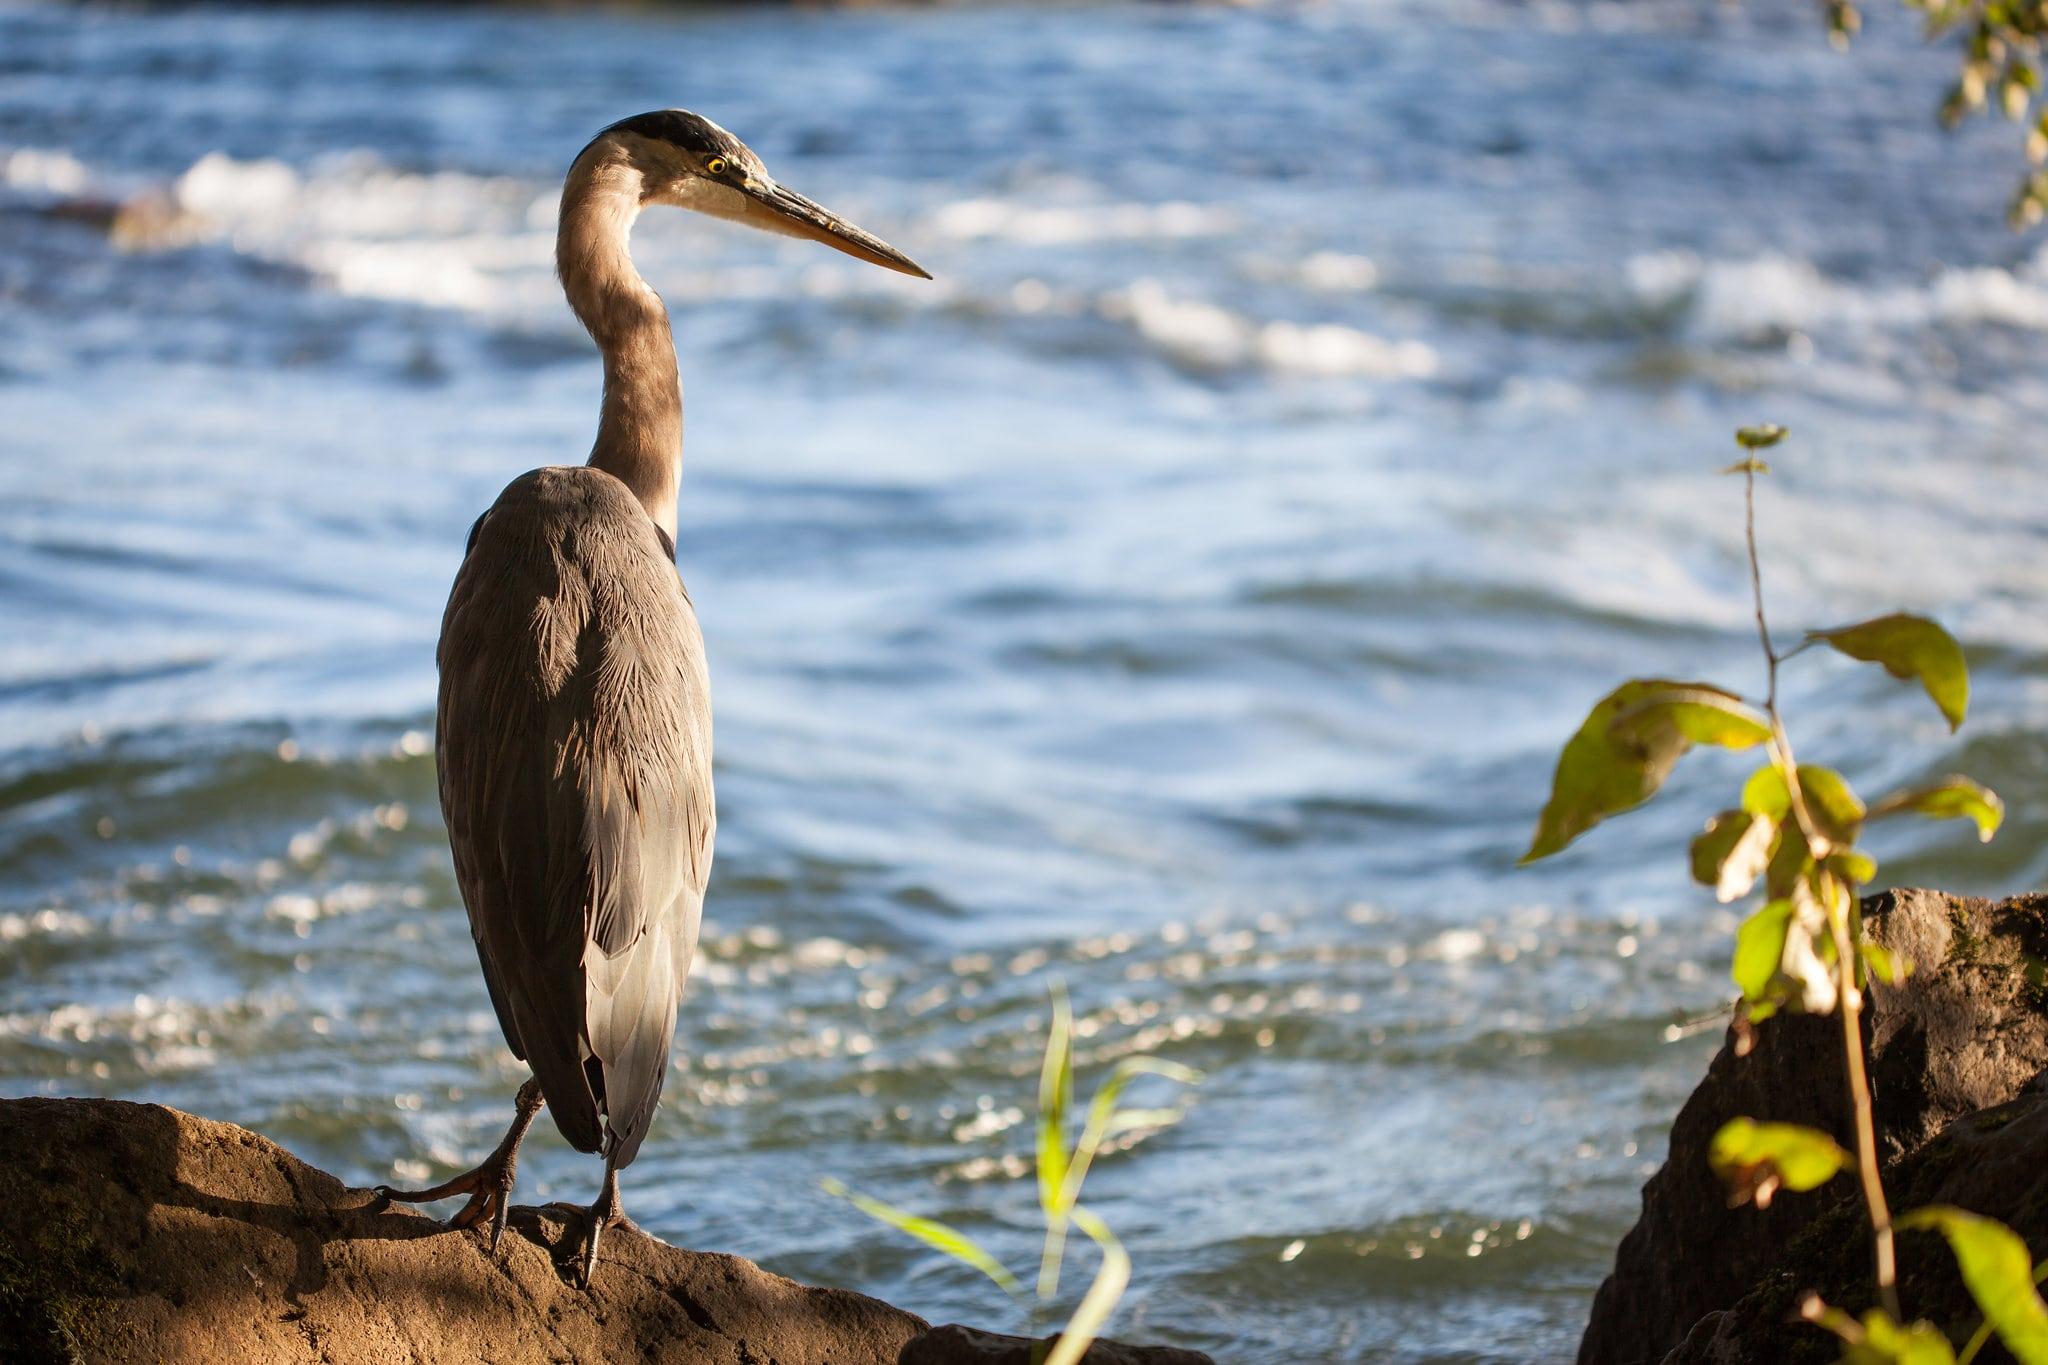 Heron - Daniel Berman Photograhy